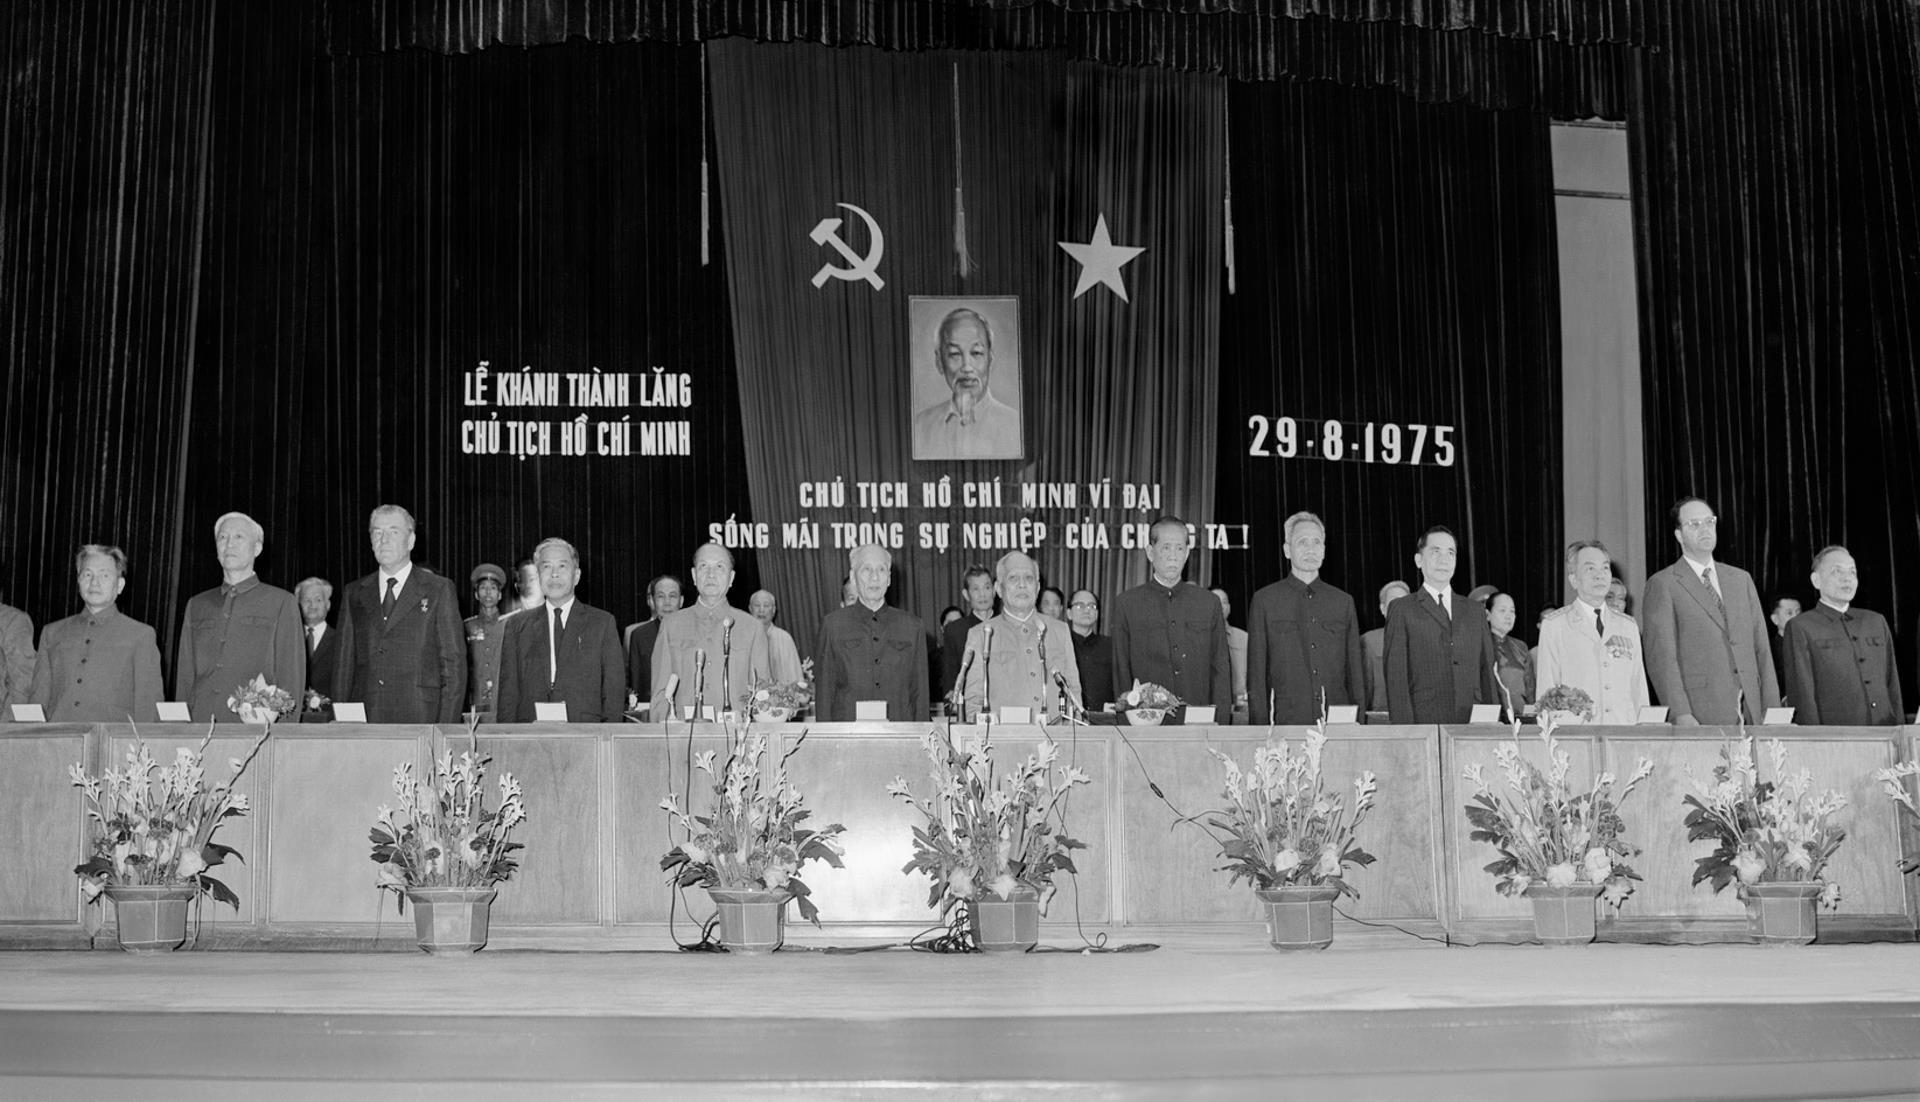 Hinh anh hiem ve 2 nam xay dung Lang Chu tich Ho Chi Minh hinh anh 9